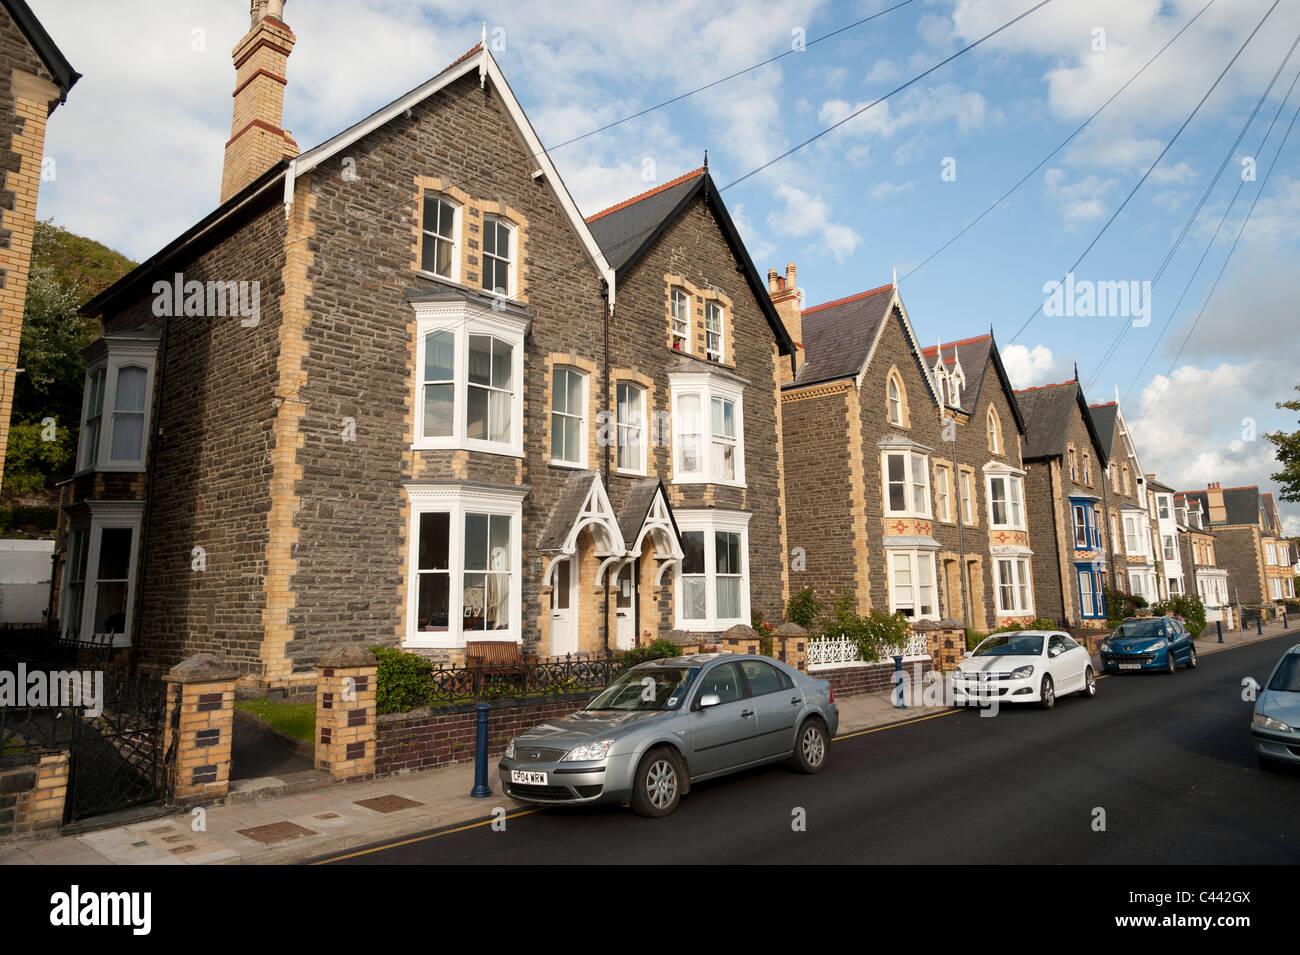 Una fila di solidamente costruito 1930 semi staccate case di città in Aberystwyth, Ceredigion, Wales UK Foto Stock